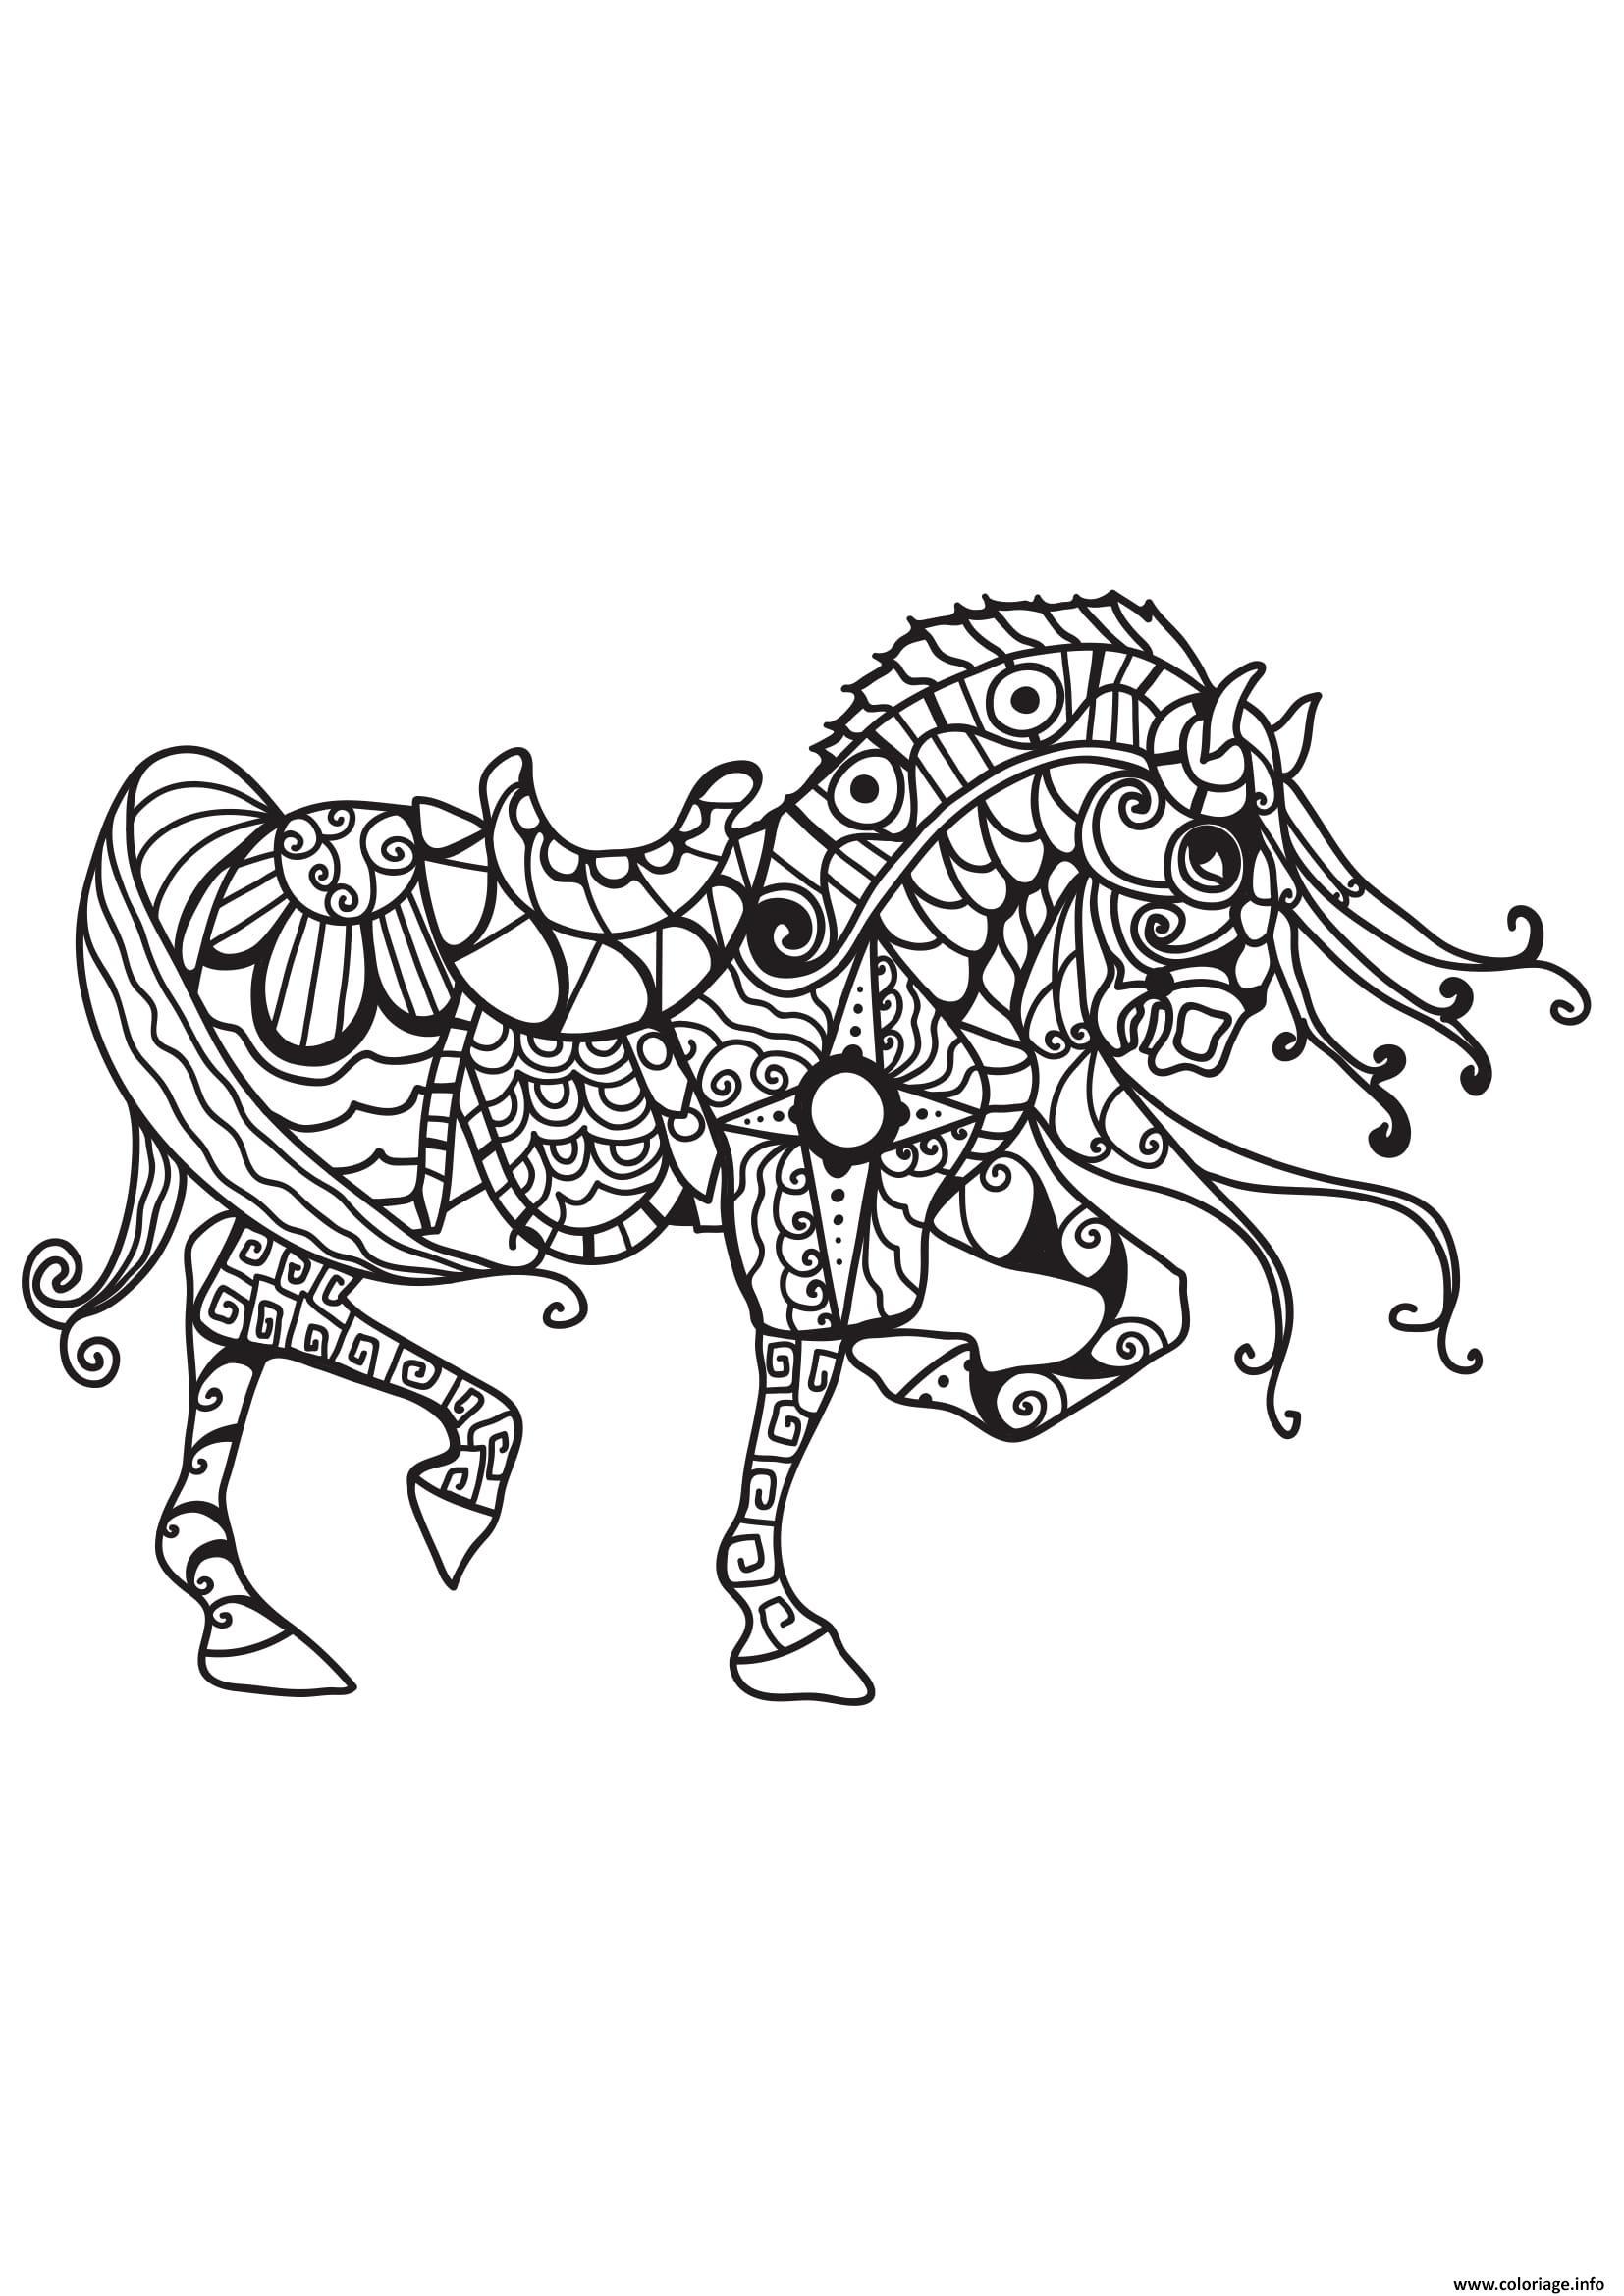 Impressionnant Dessin A Imprimer Cheval Mandala